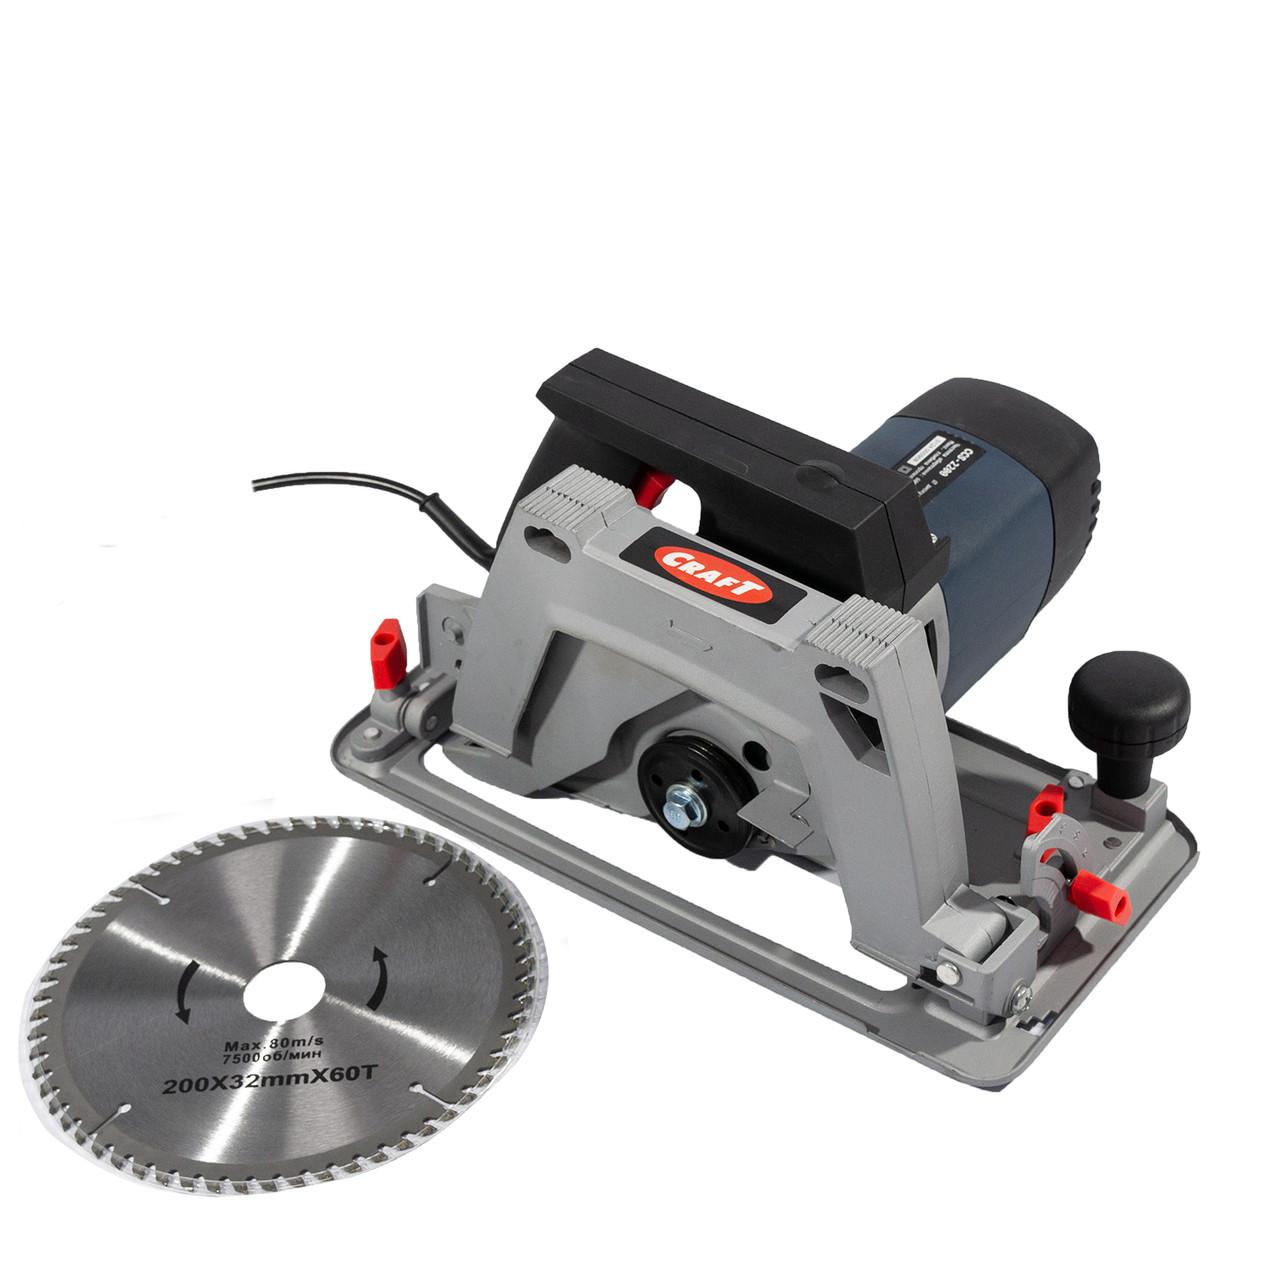 Пила дисковая циркулярная Craft CCS-2200